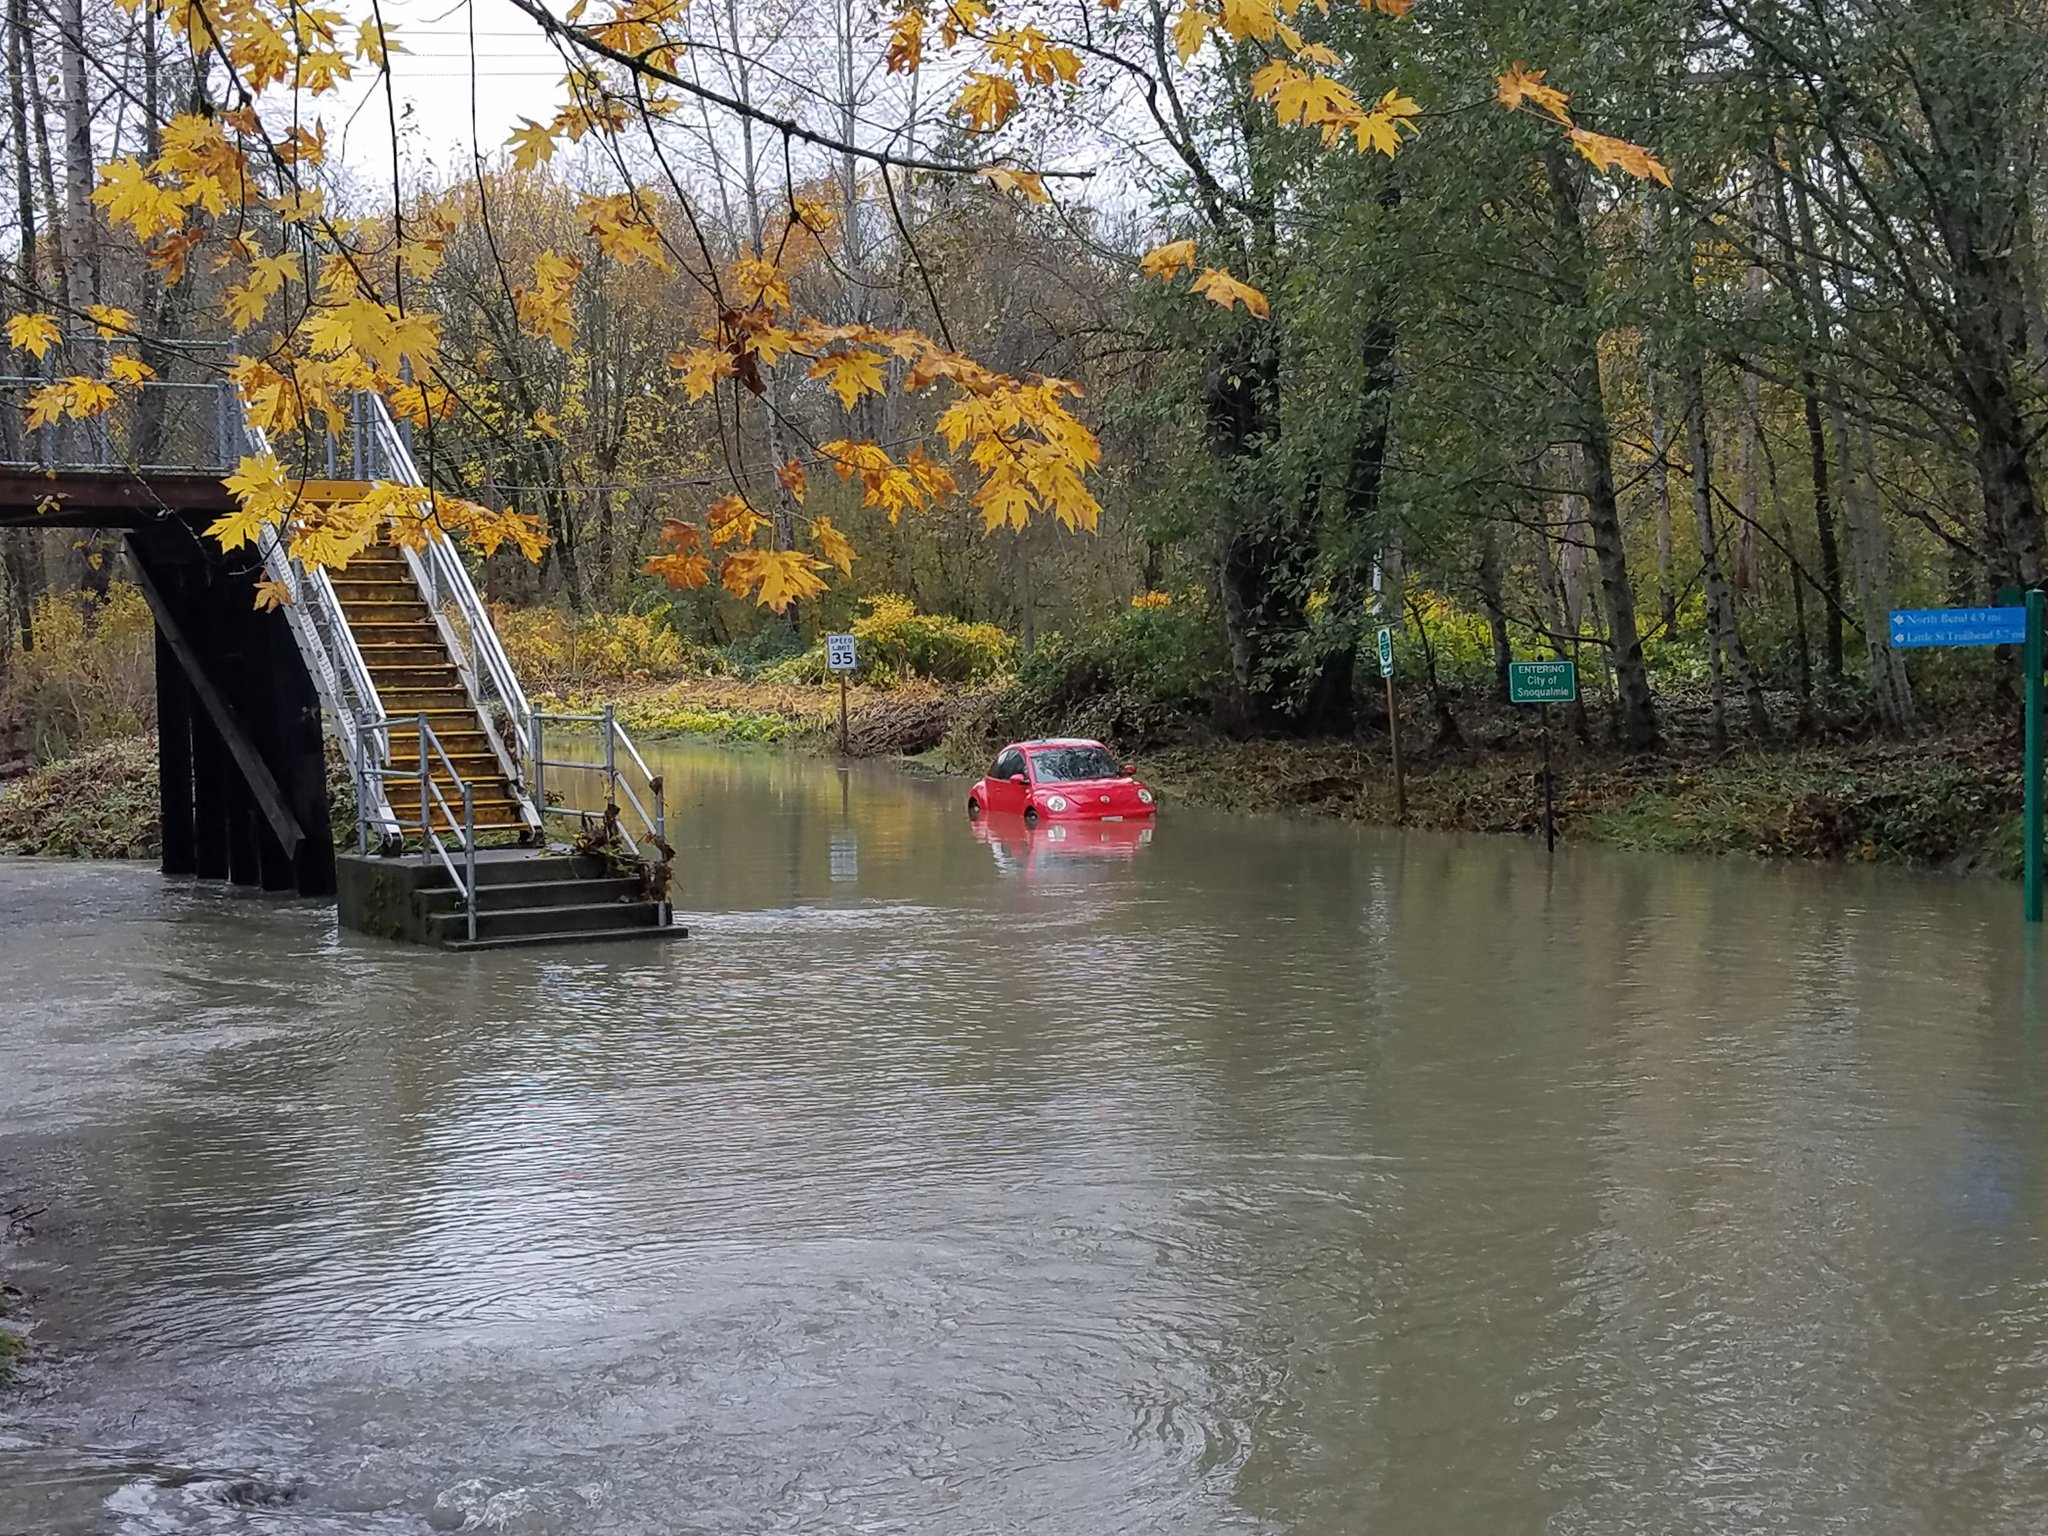 Rains bring floods to parts of Western Washington